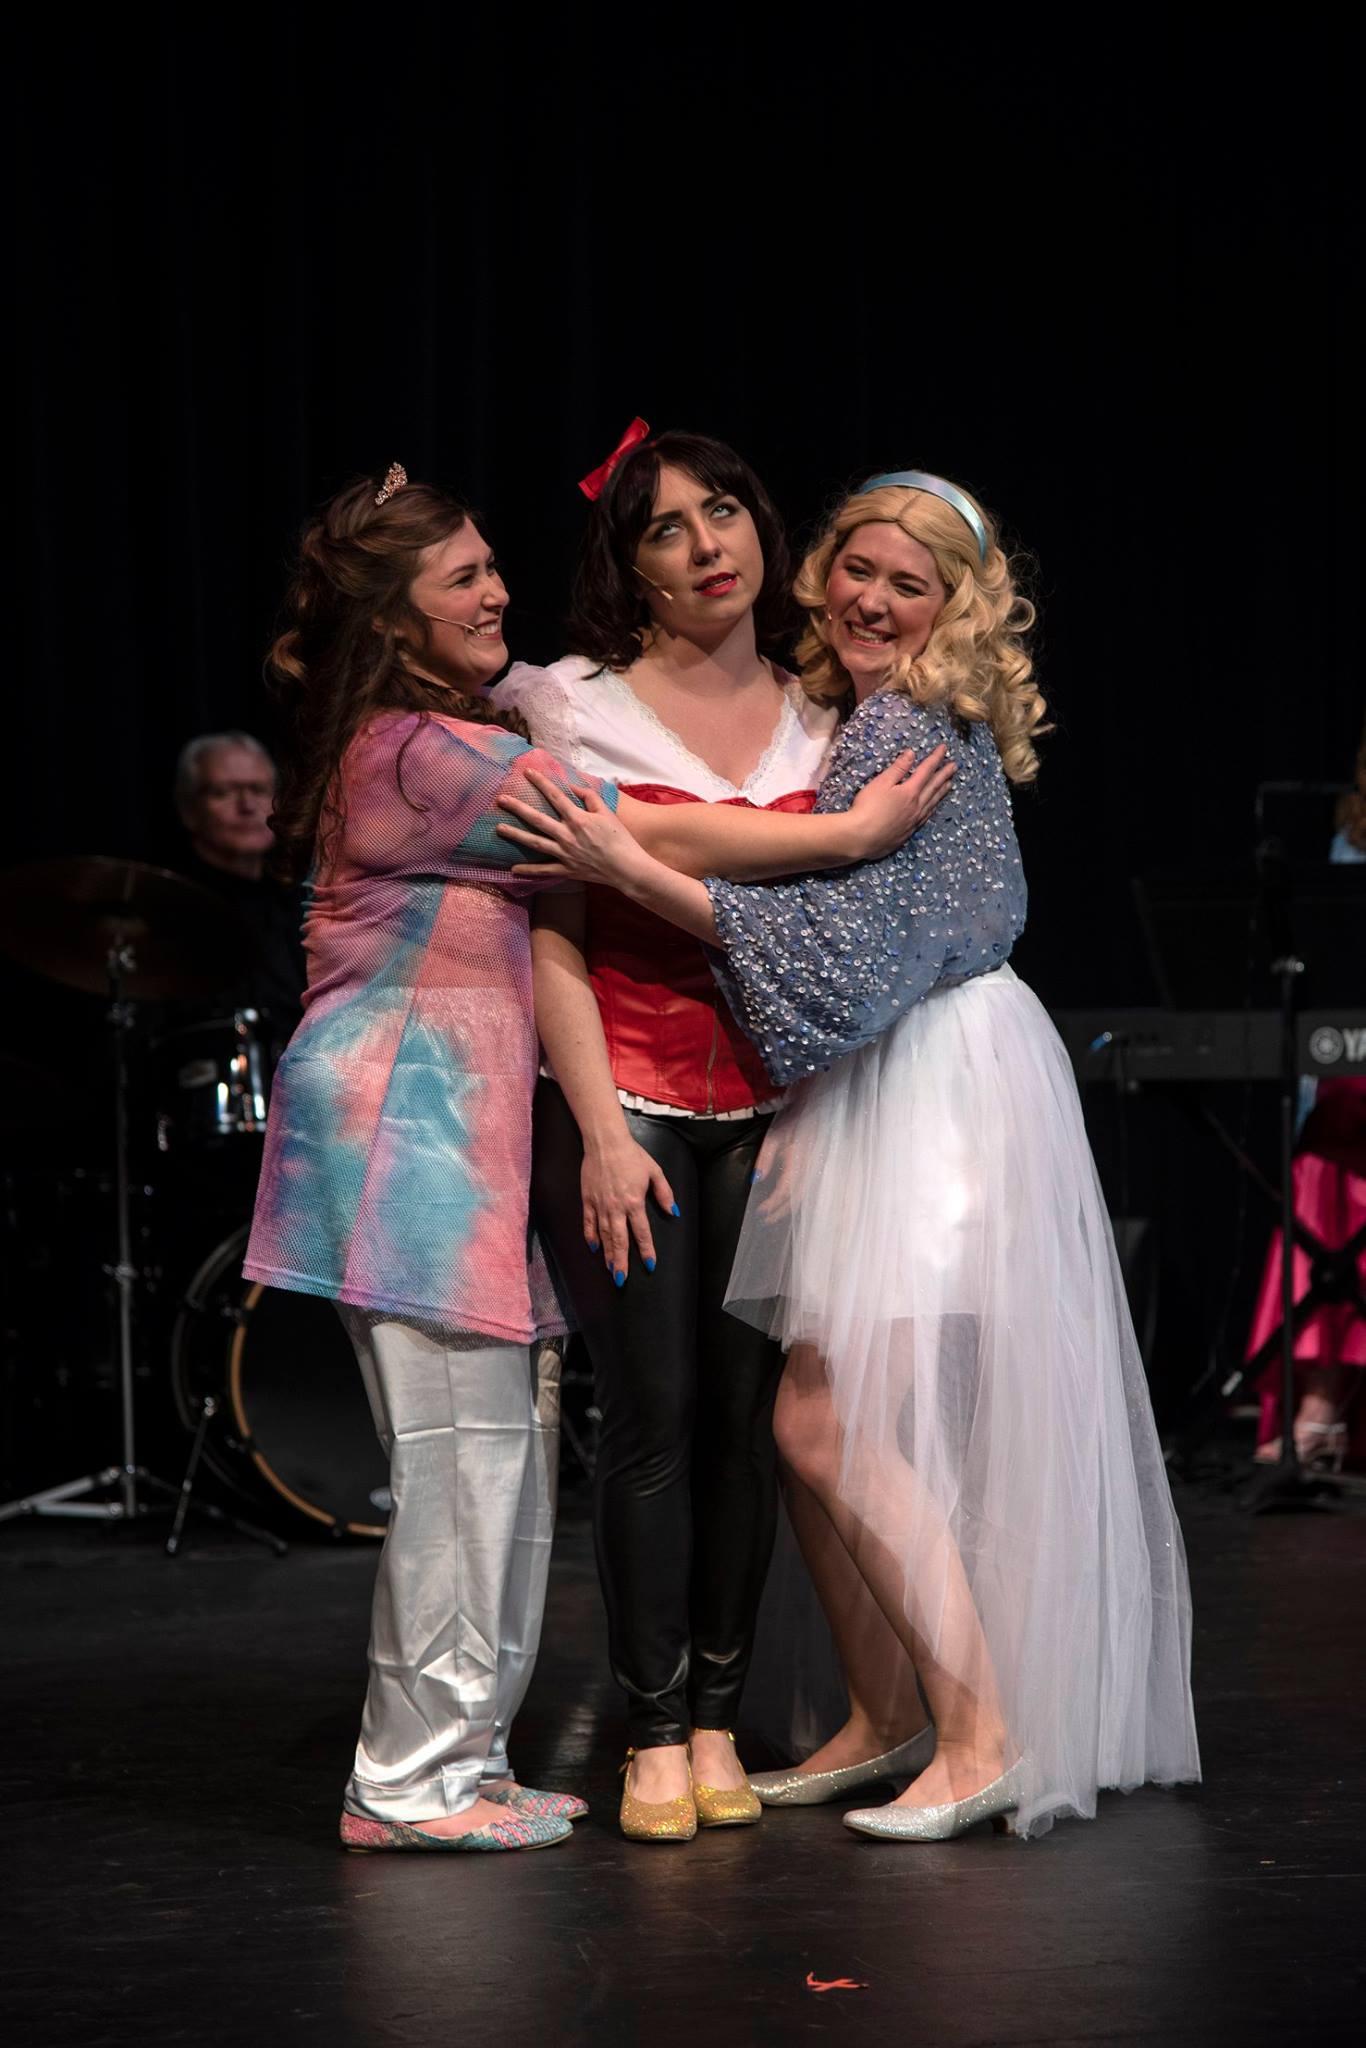 Snow White (Samantha Paige) gets hugs from Sleeping Beauty (Gabriella Ashlin, left) and Cinderella (Emma Losey).